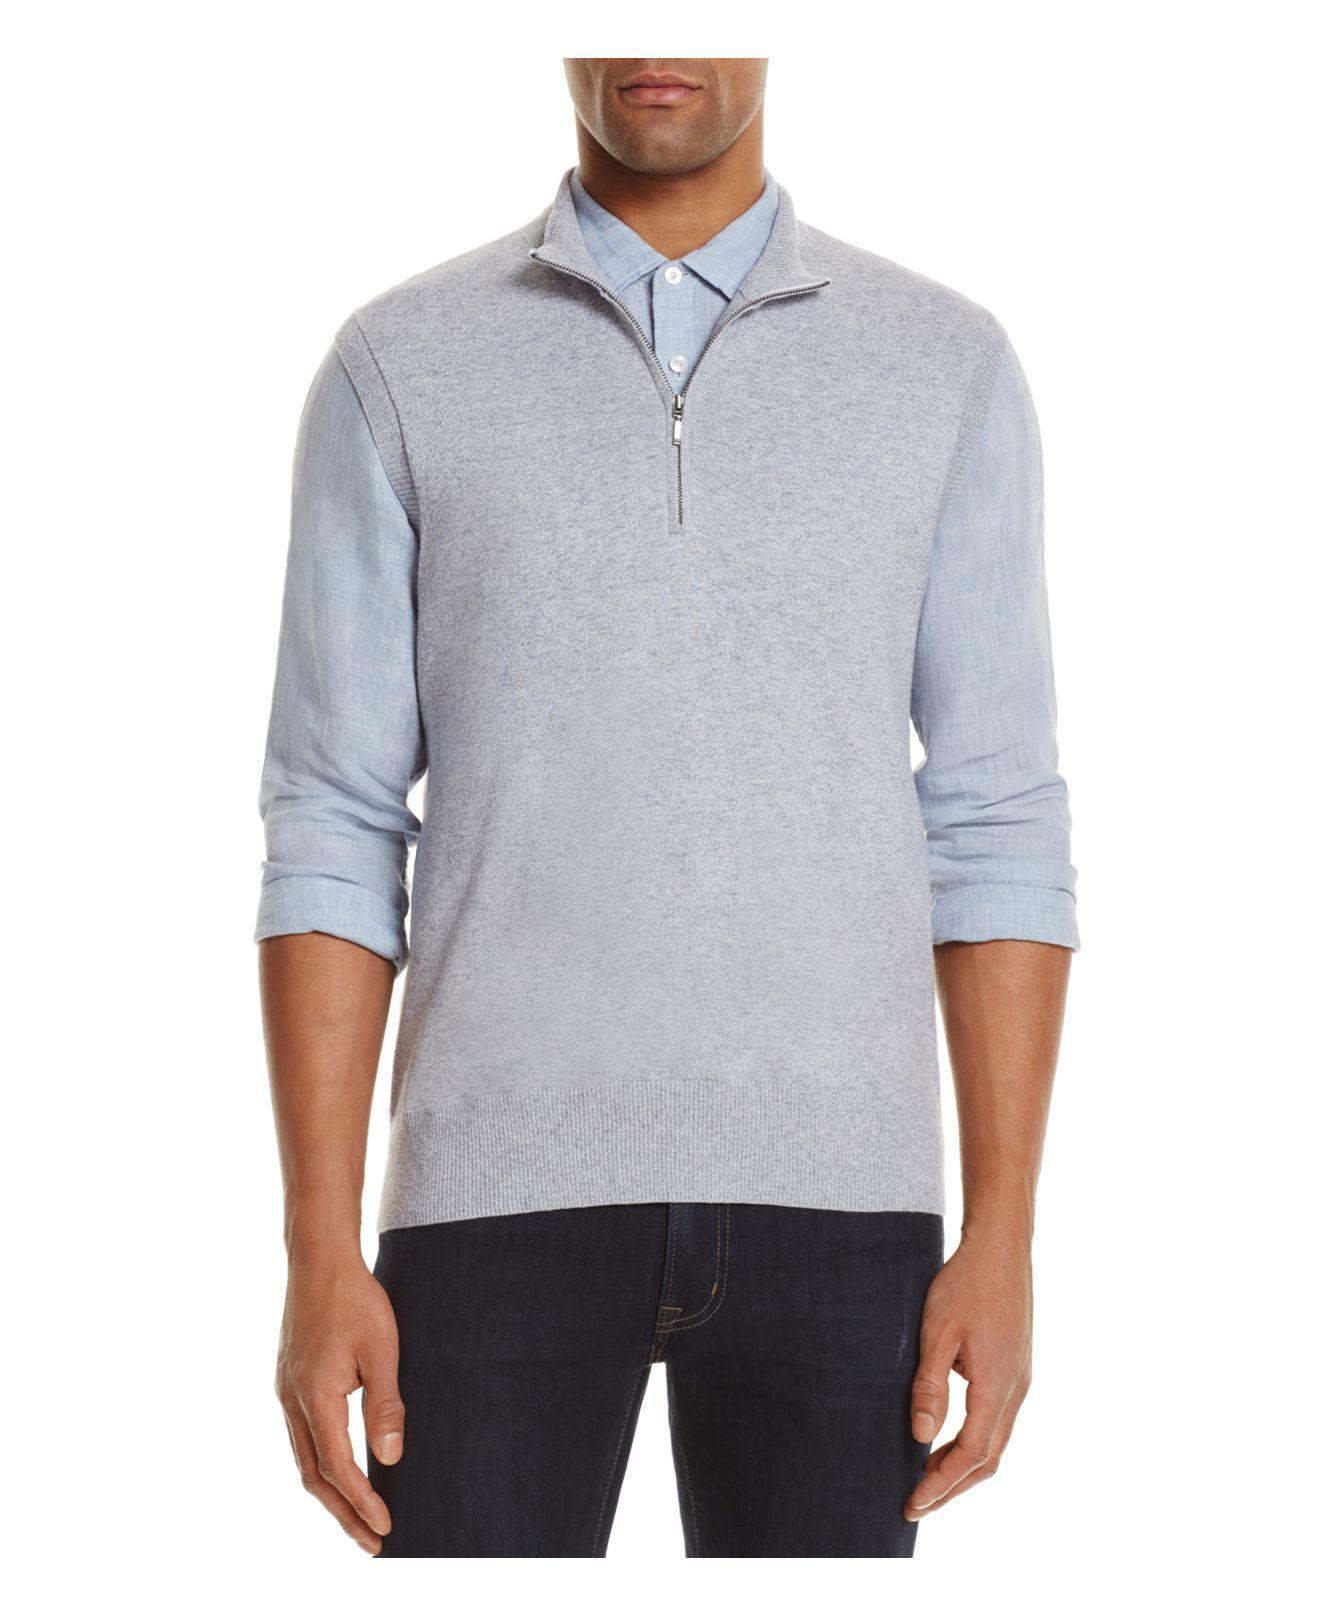 Ag green label Voss Cashmere Blend Half-zip Sweater Vest in Gray ...